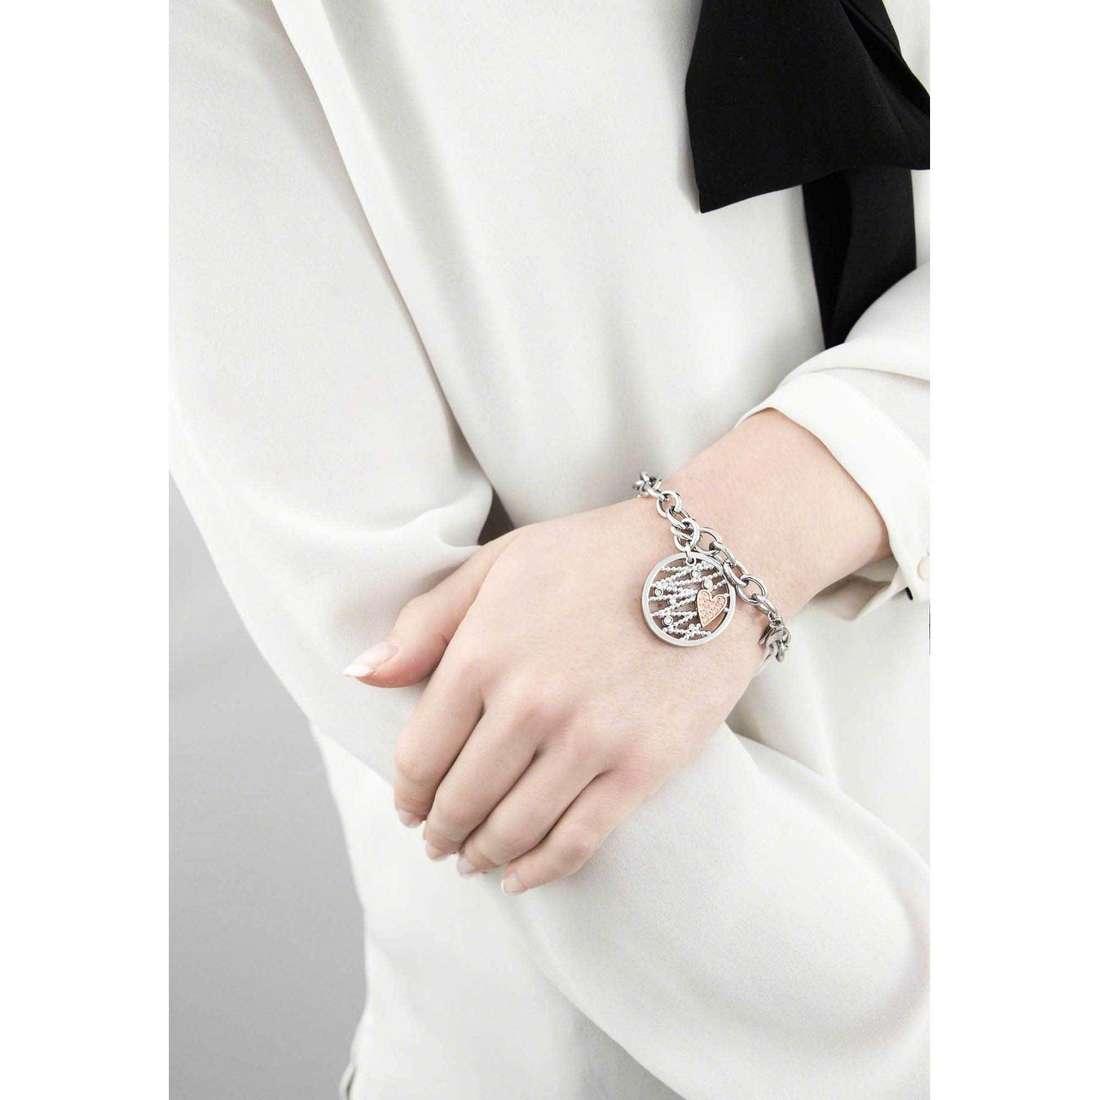 Morellato bracelets Cuore Mio femme SADA08 indosso